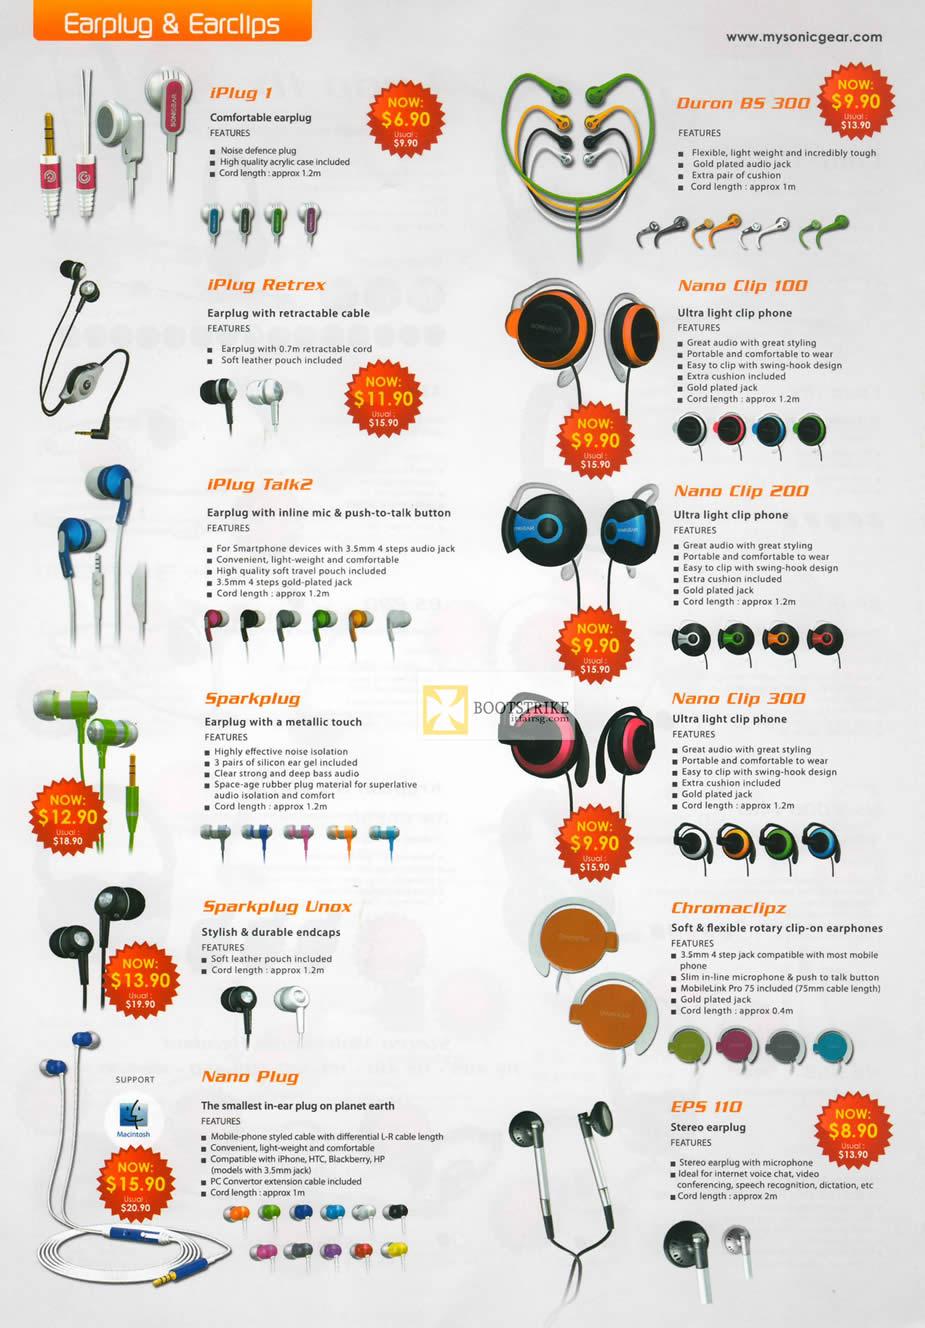 IT SHOW 2012 price list image brochure of Leap Frog Sonicgear Earplug Earclips IPlug 1, Retrex, Talk2, Duron BS 300, Nano Clip 100, Clip 200, Sparkplug, Unox, EPS 110